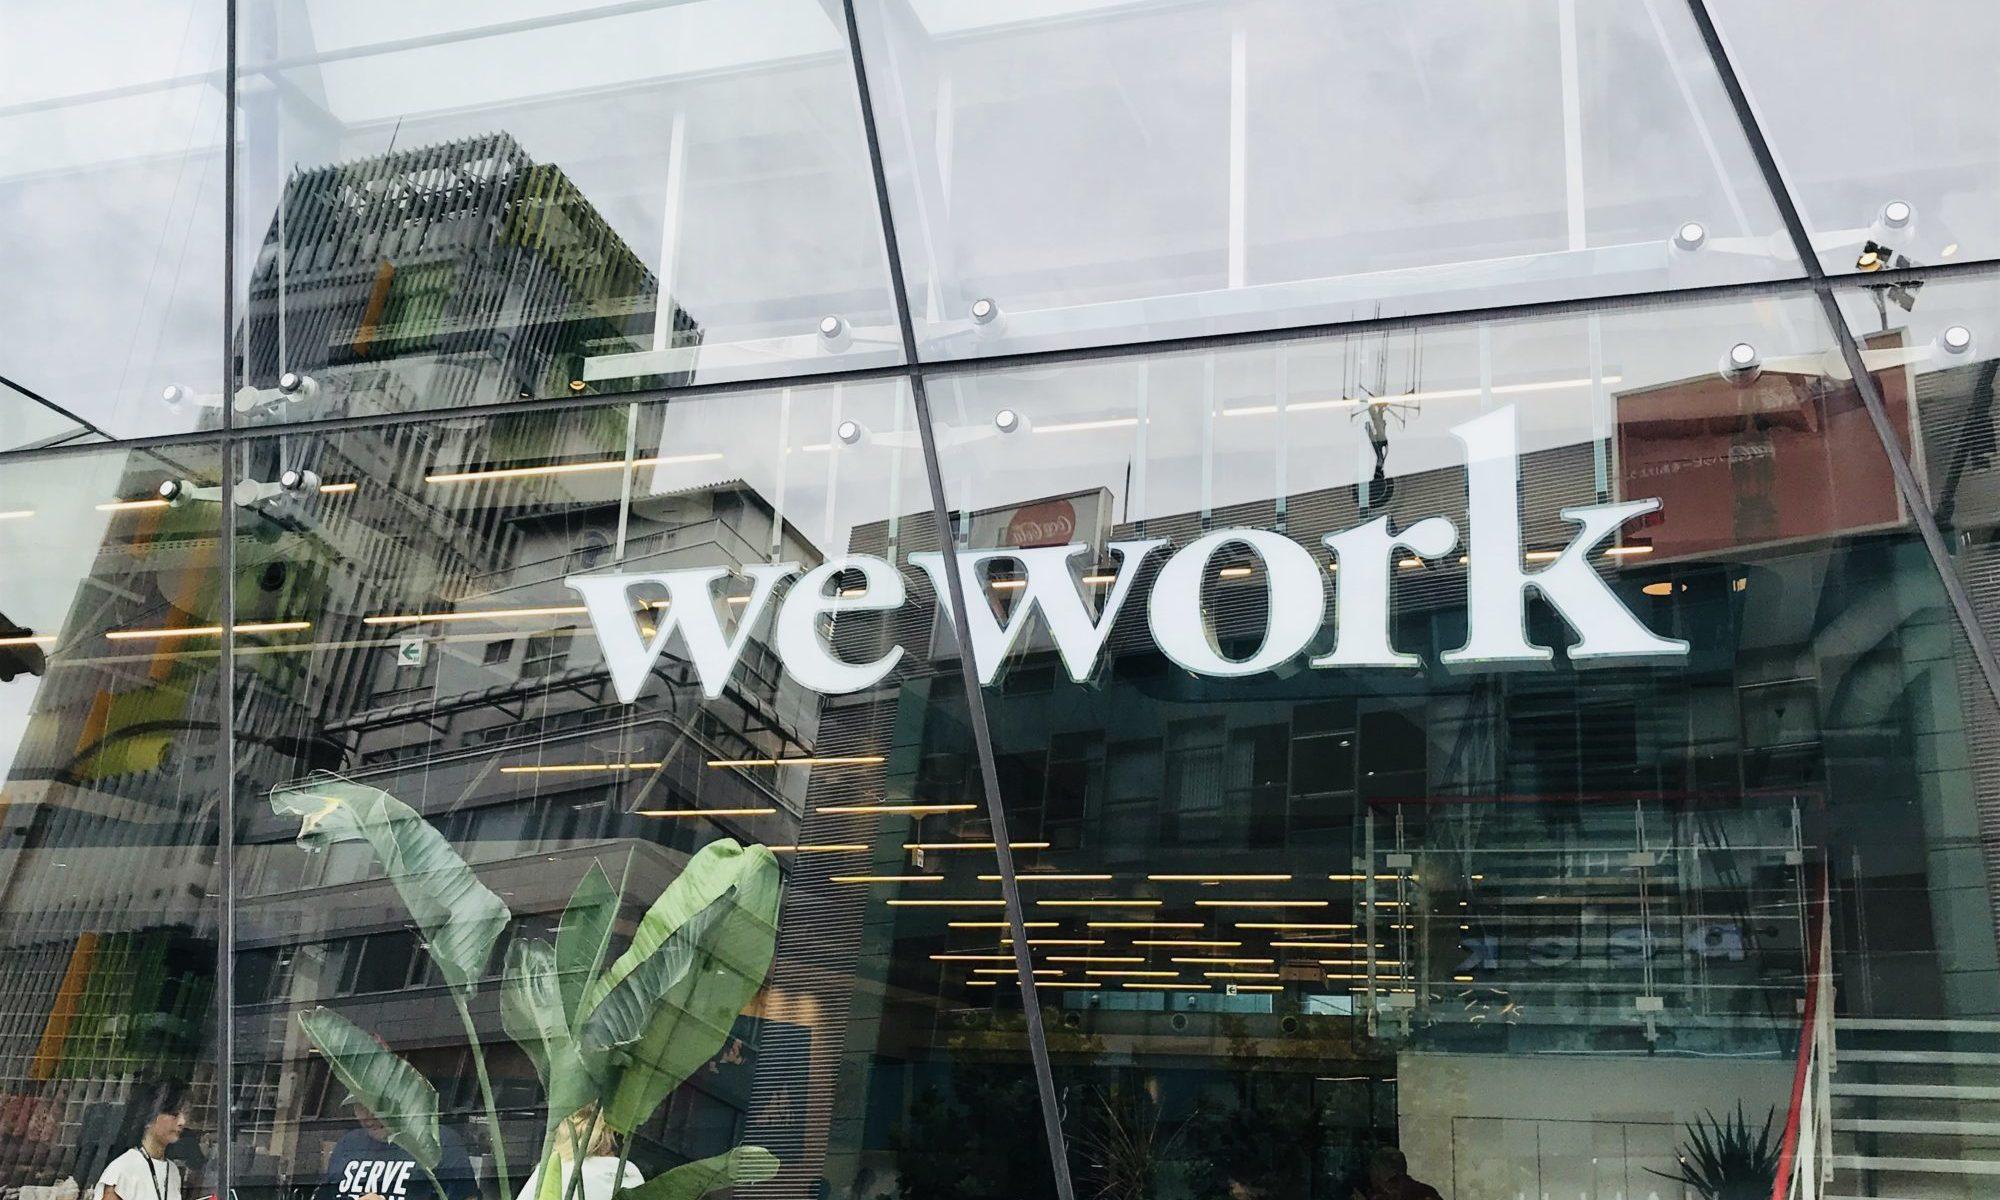 WeWorkIceberg